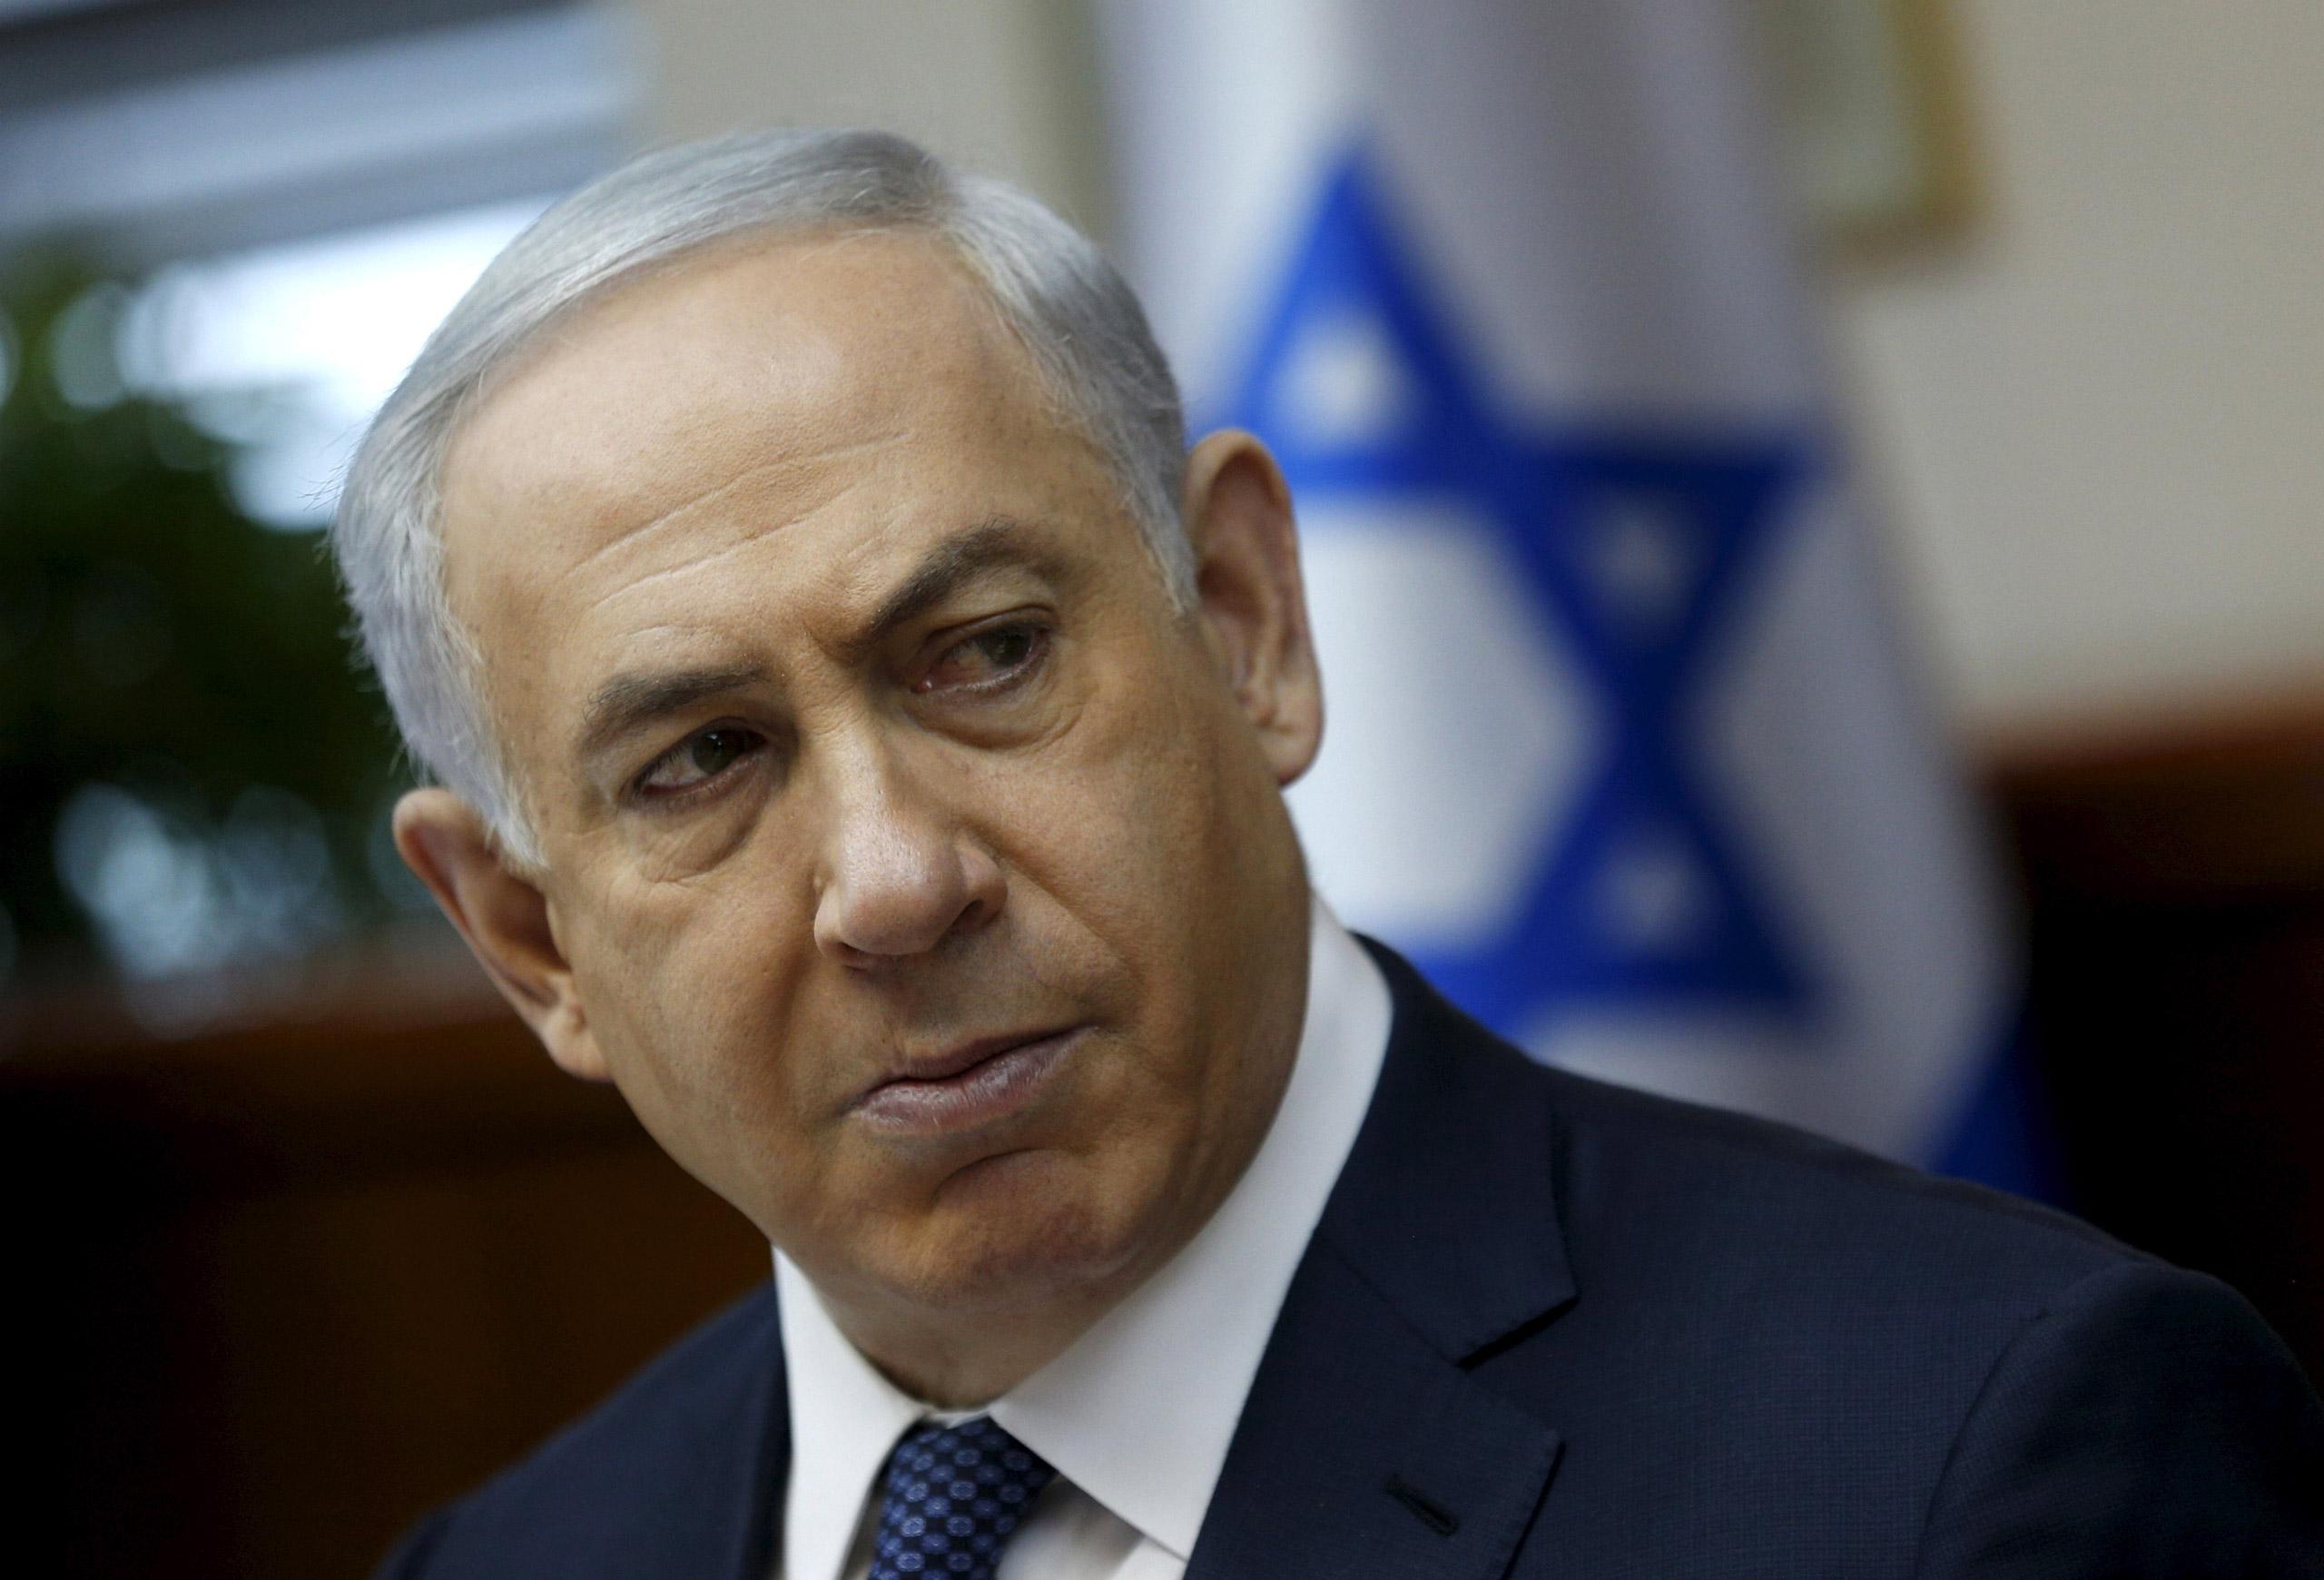 Israeli Prime Minister Benjamin Netanyahu attends the weekly cabinet meeting in Jerusalem on Jan. 3,  2016.